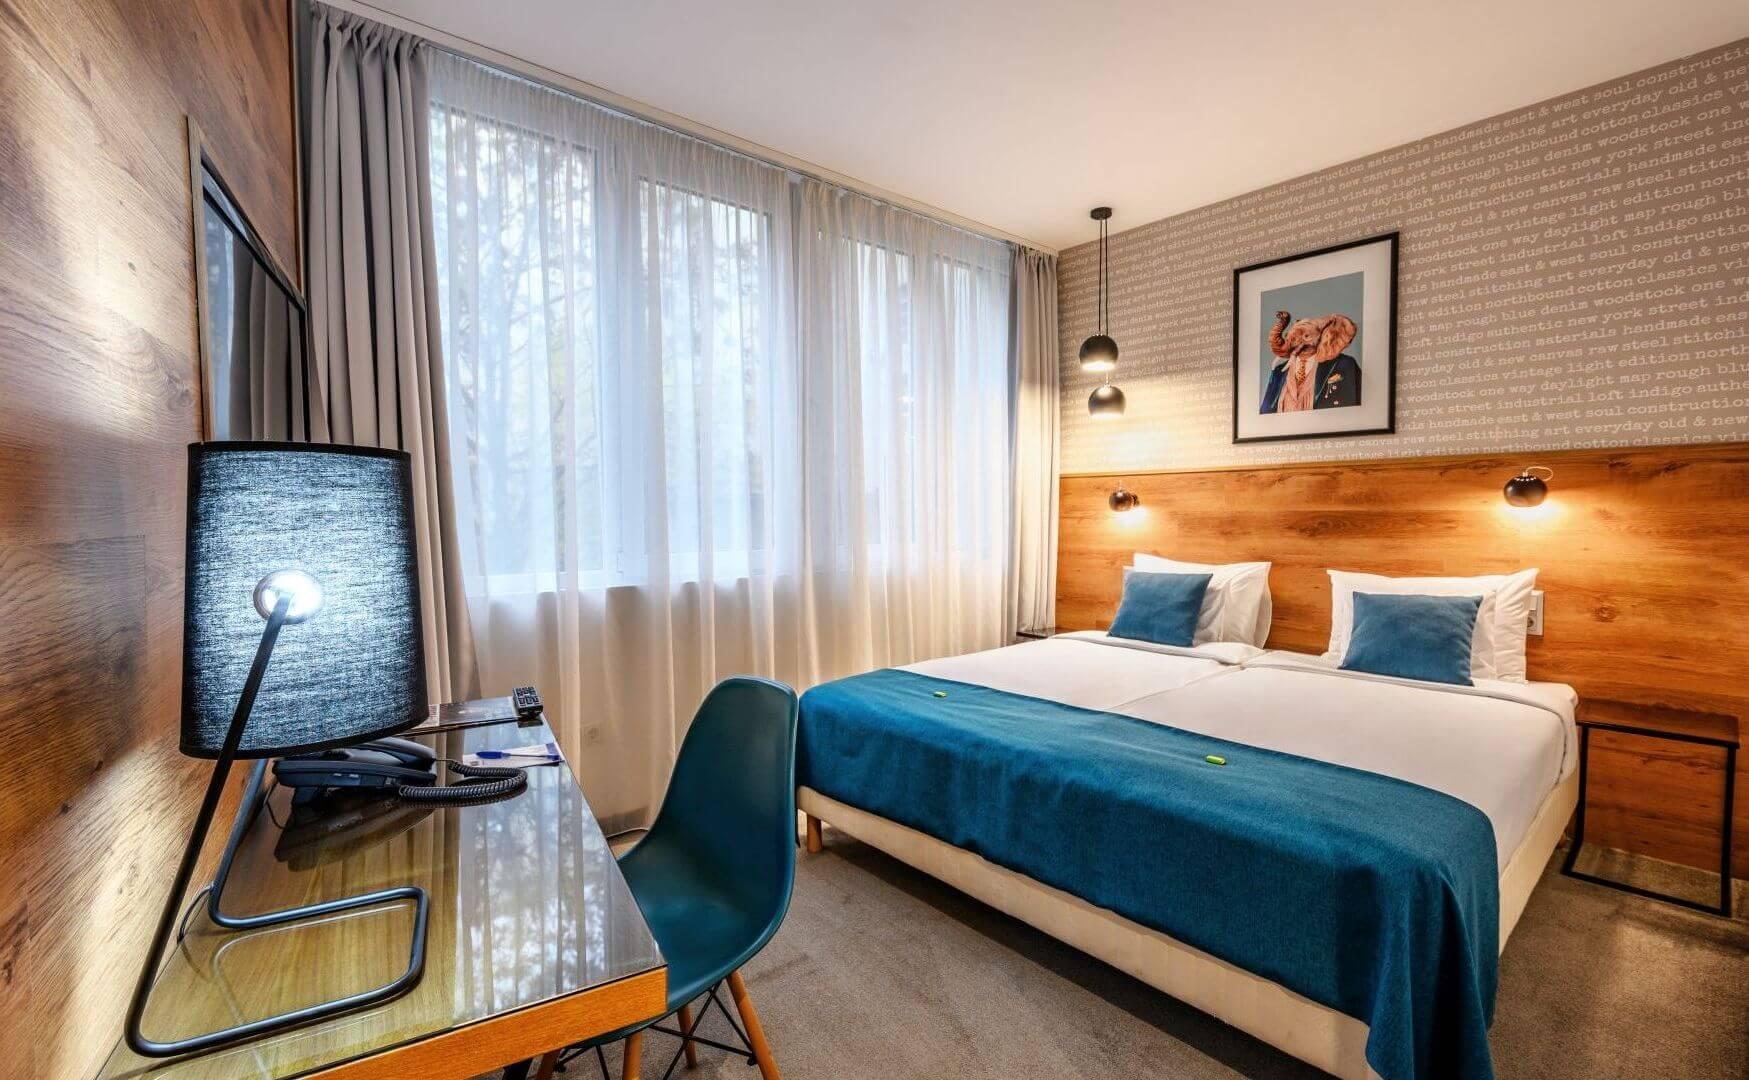 Roombach Hotel Budapest בית מלון 3 כוכבים בבודפשט בלב העיר